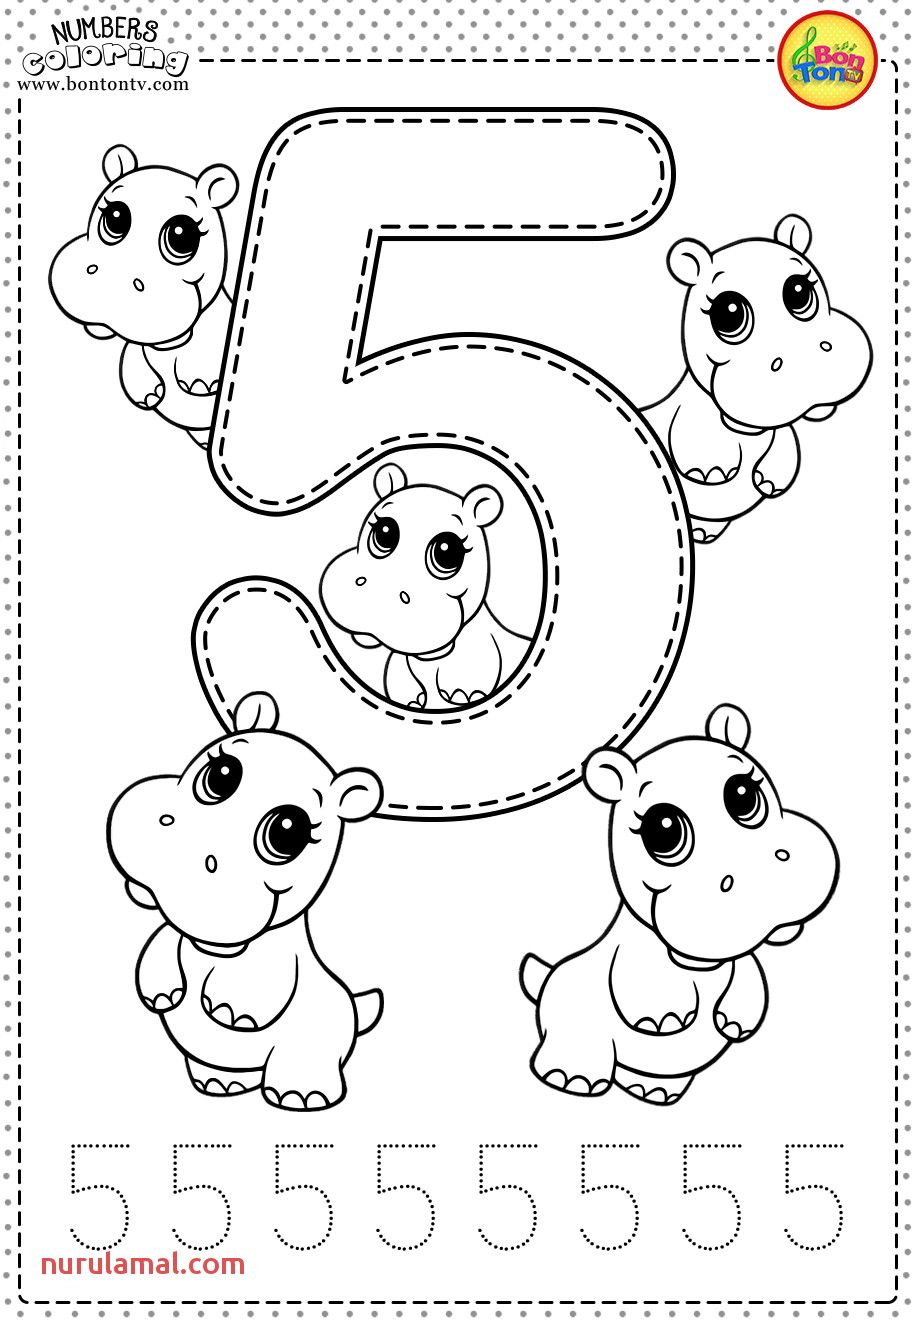 Worksheets for 3 Year Olds Preschool Worksheets - Preschool Children  Akctivitiys [ 1321 x 915 Pixel ]